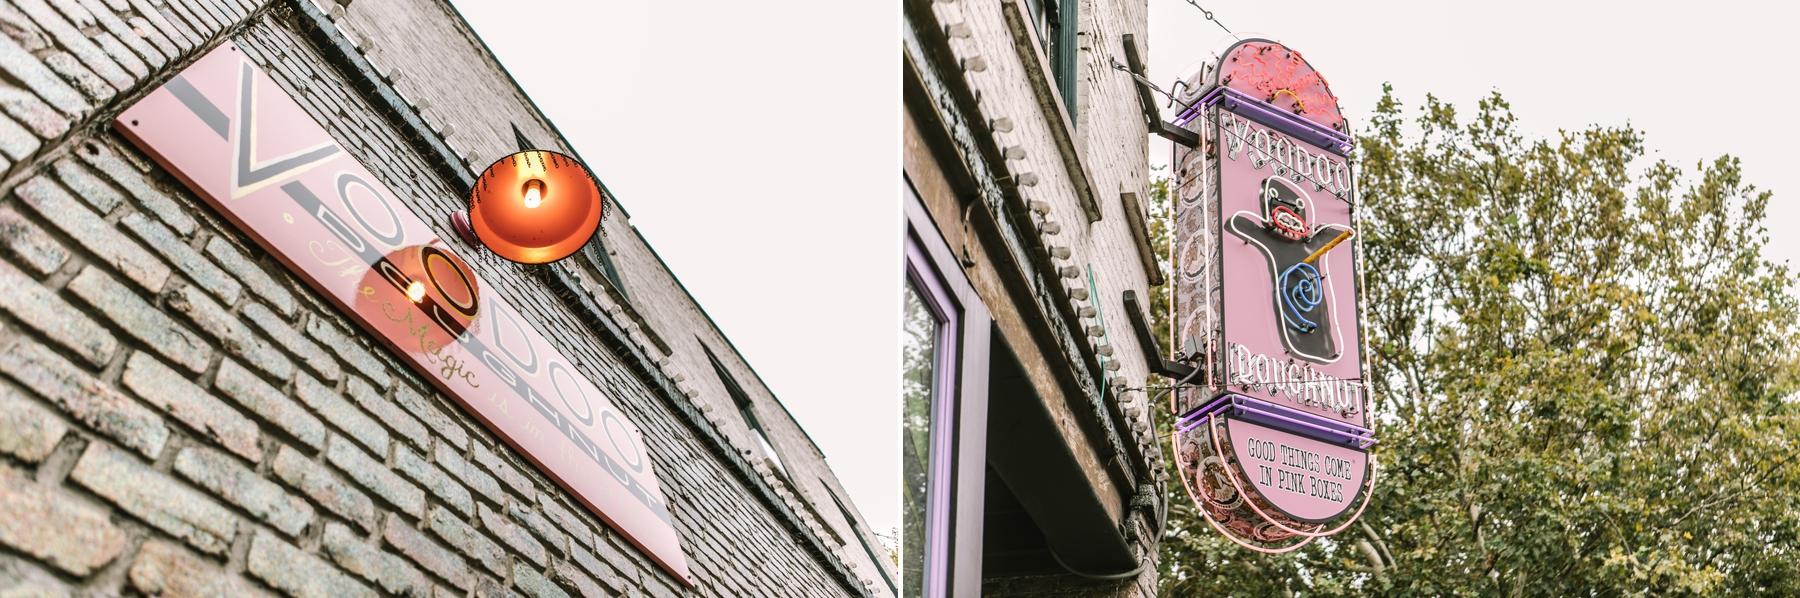 brianna-caster-and-co-photographers-portland-4